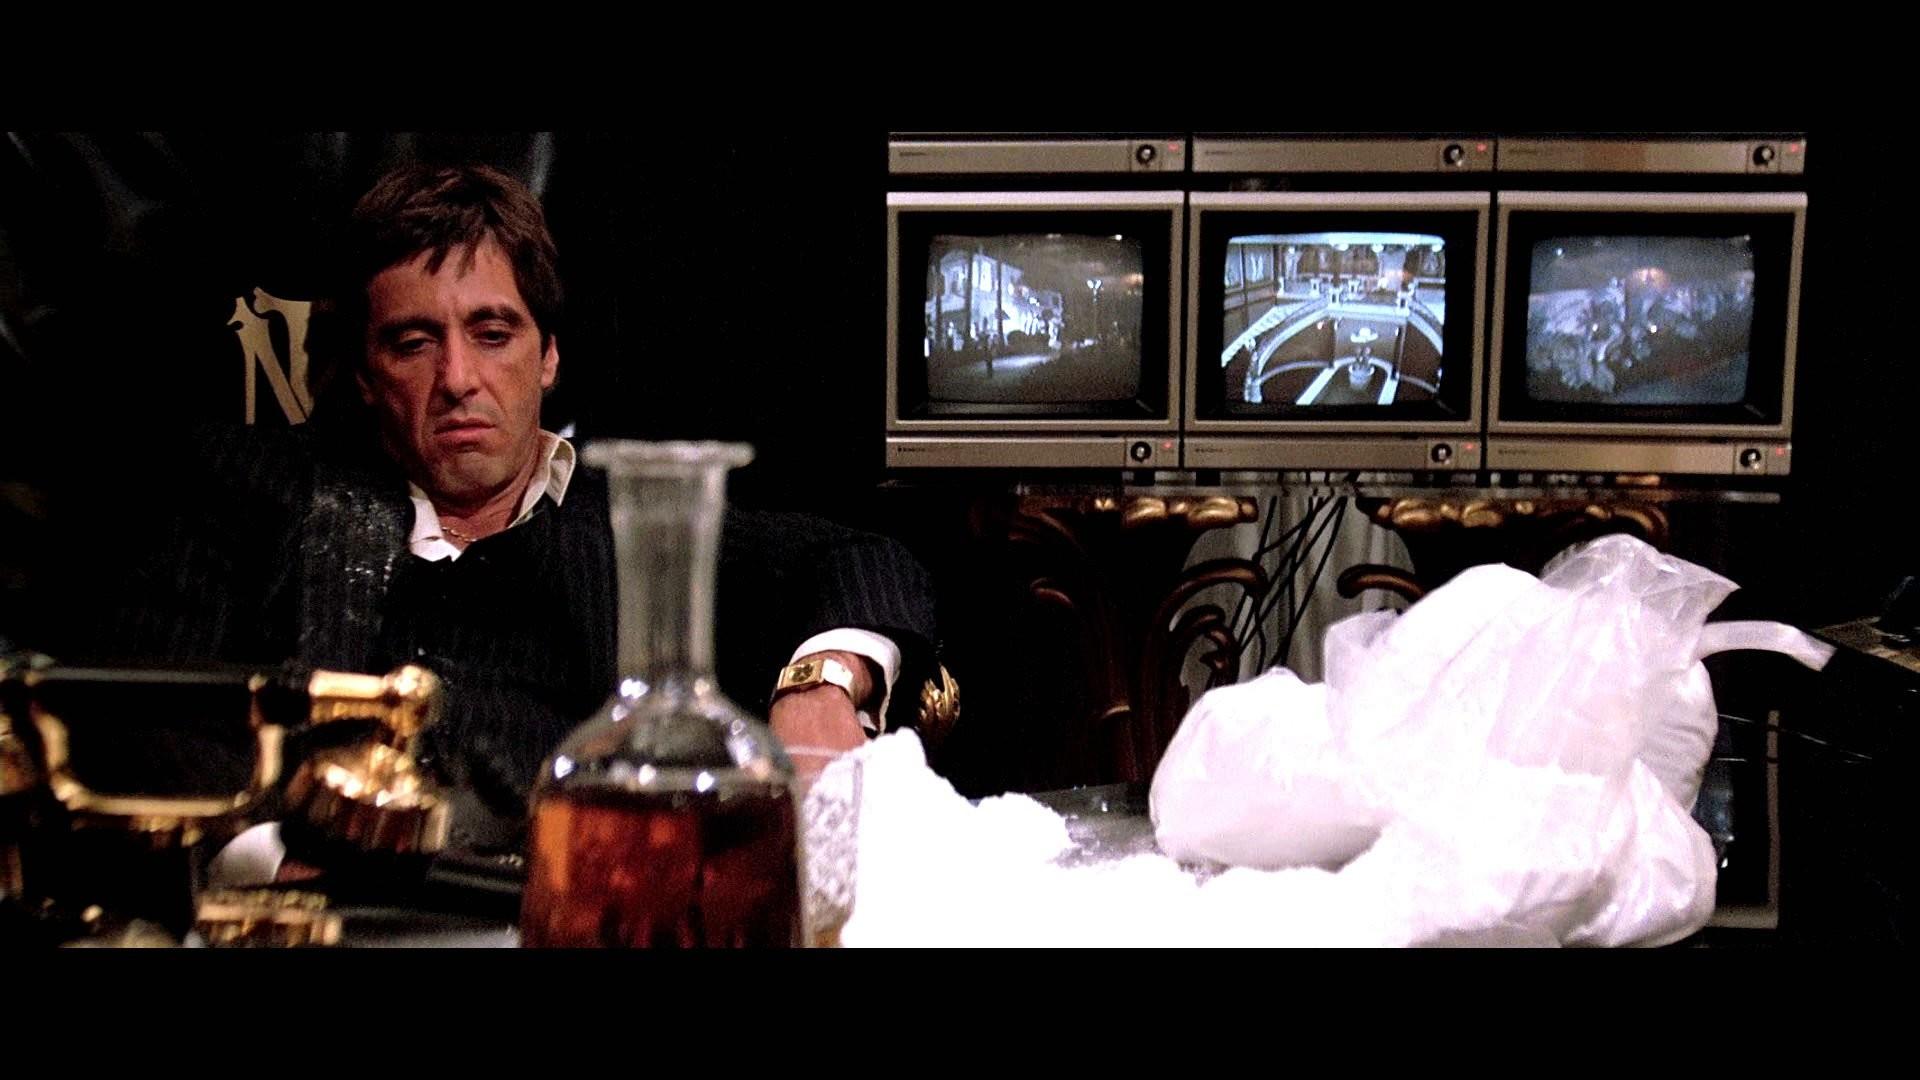 SCARFACE crime drama movie film drugs dark wallpaper | | 333953 |  WallpaperUP